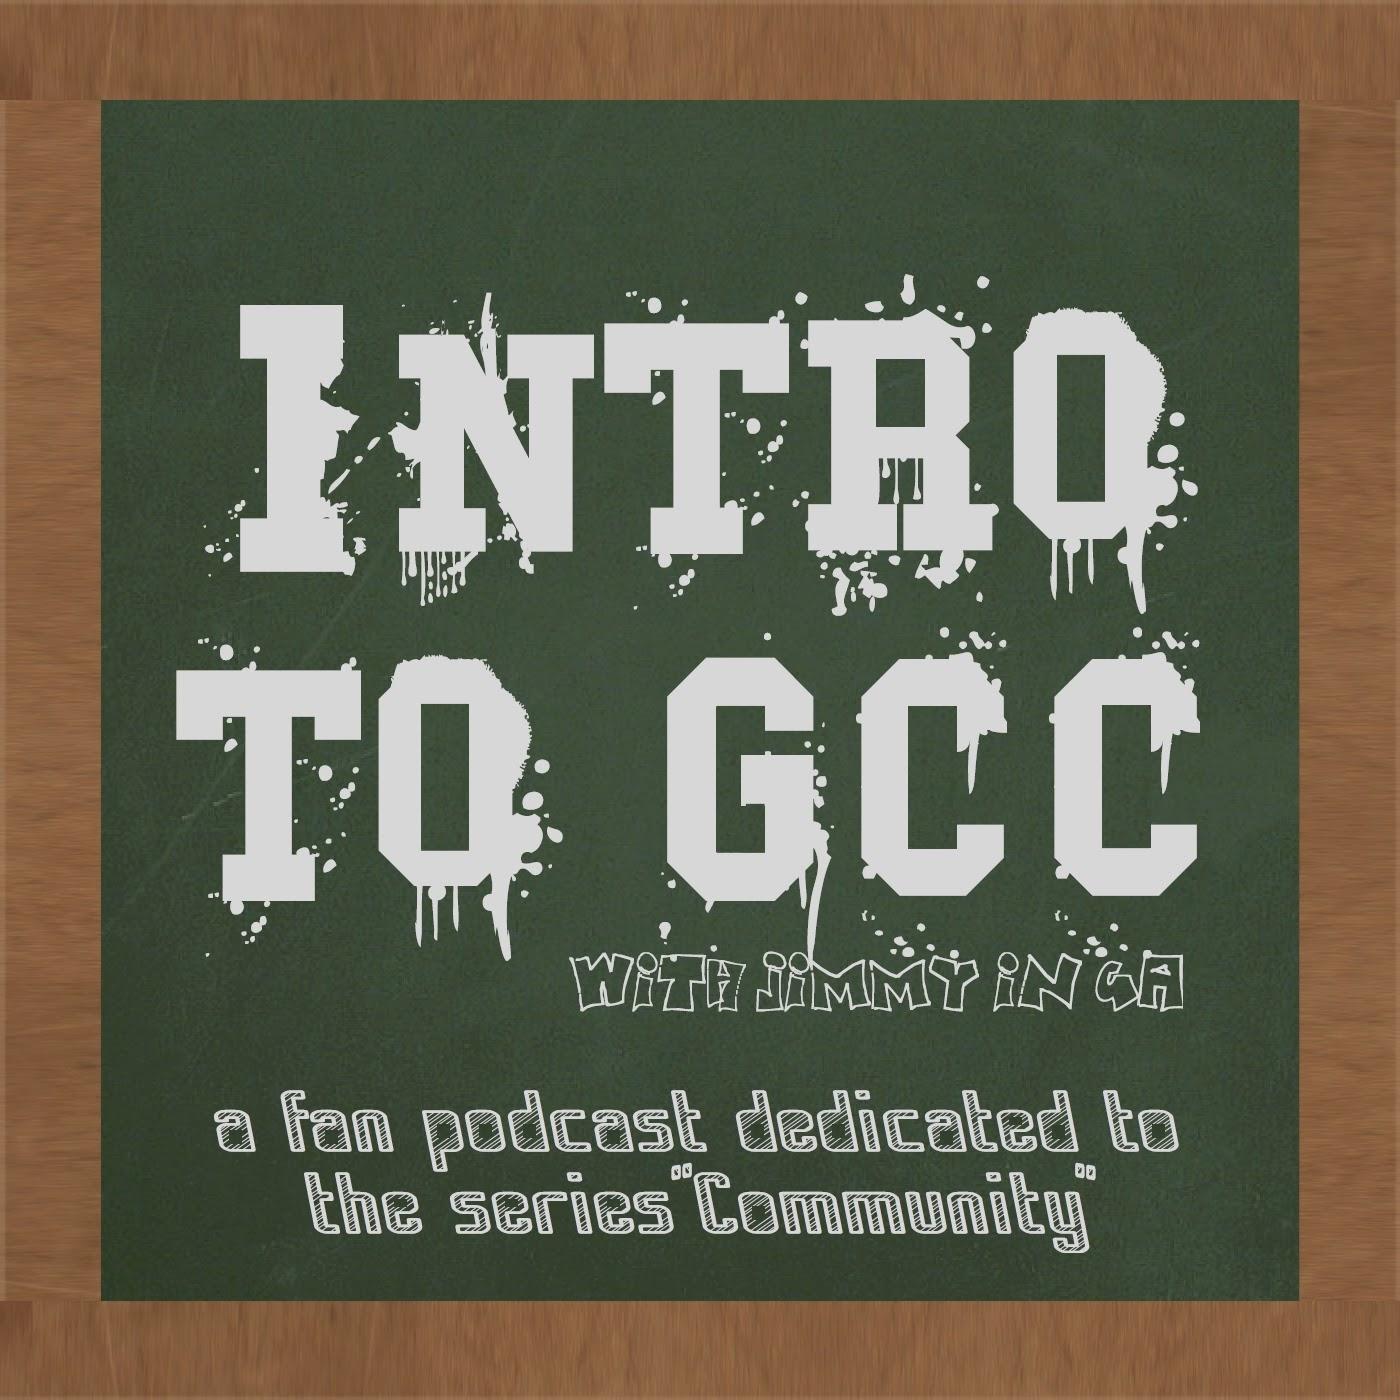 http://www.introtogcc.com/